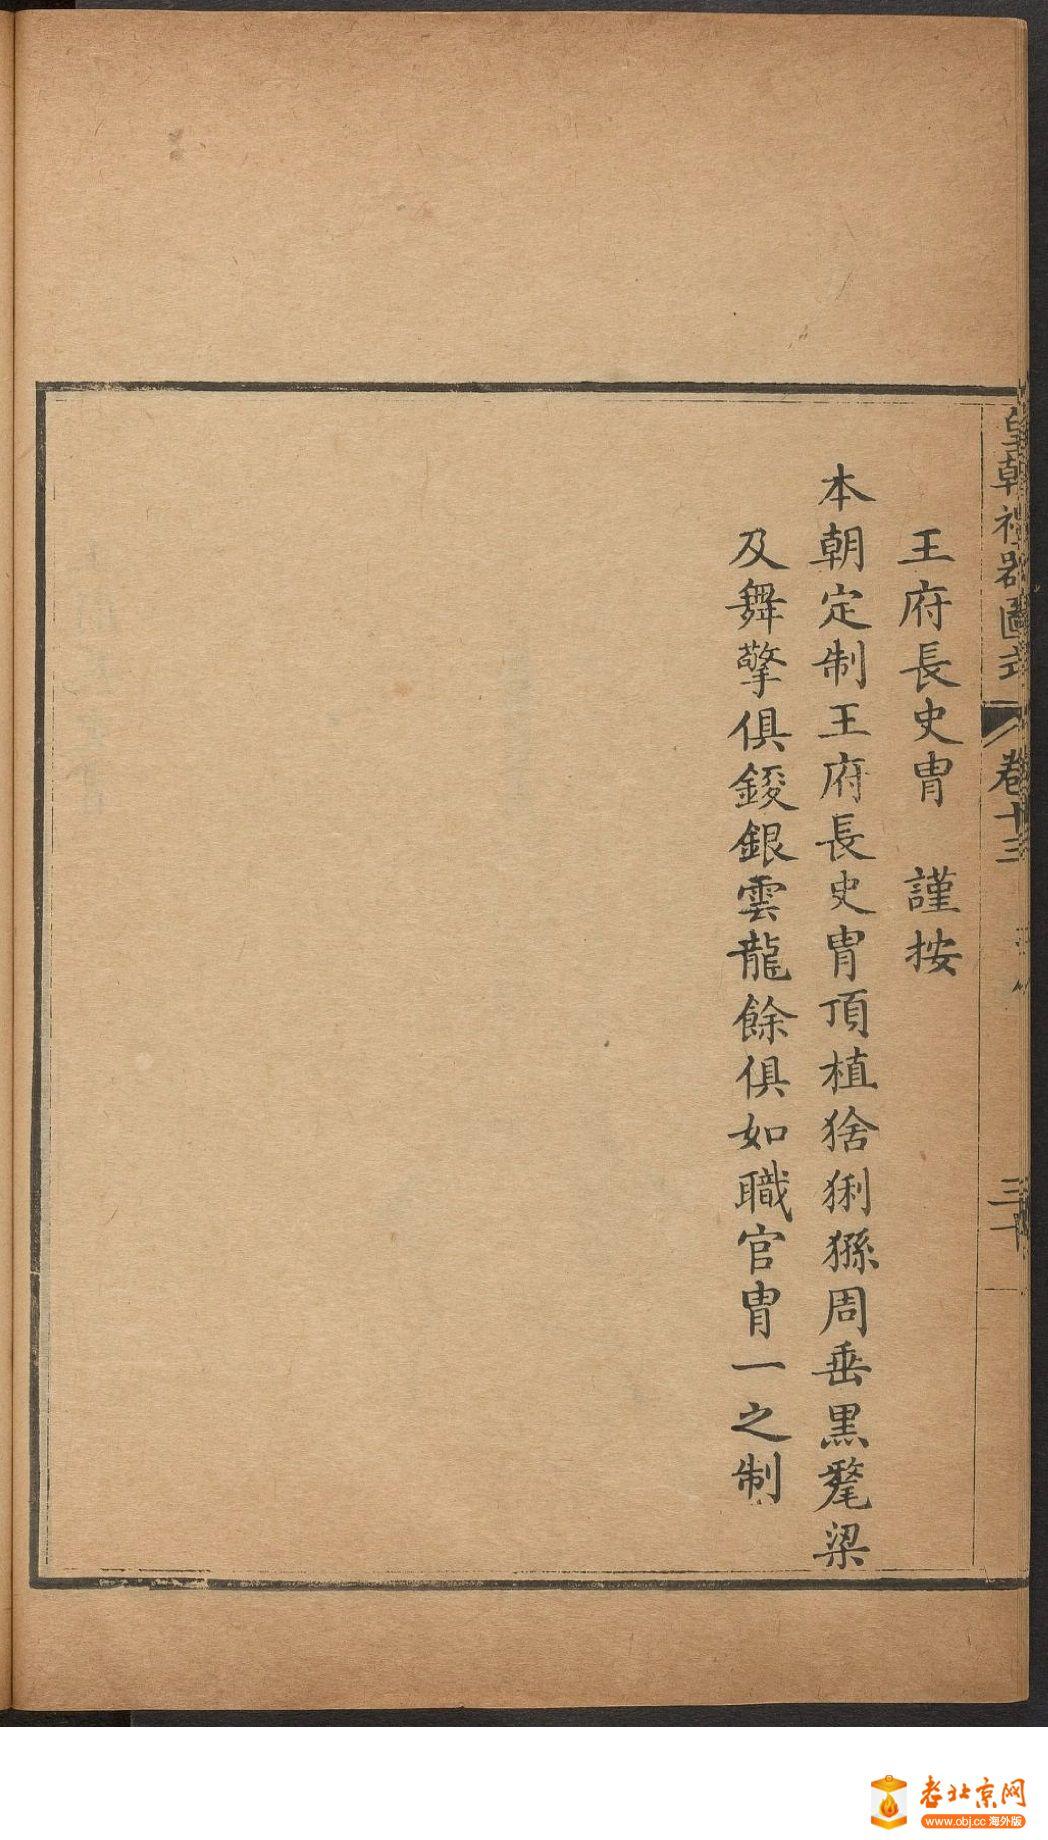 4_page1_image1b.jpg